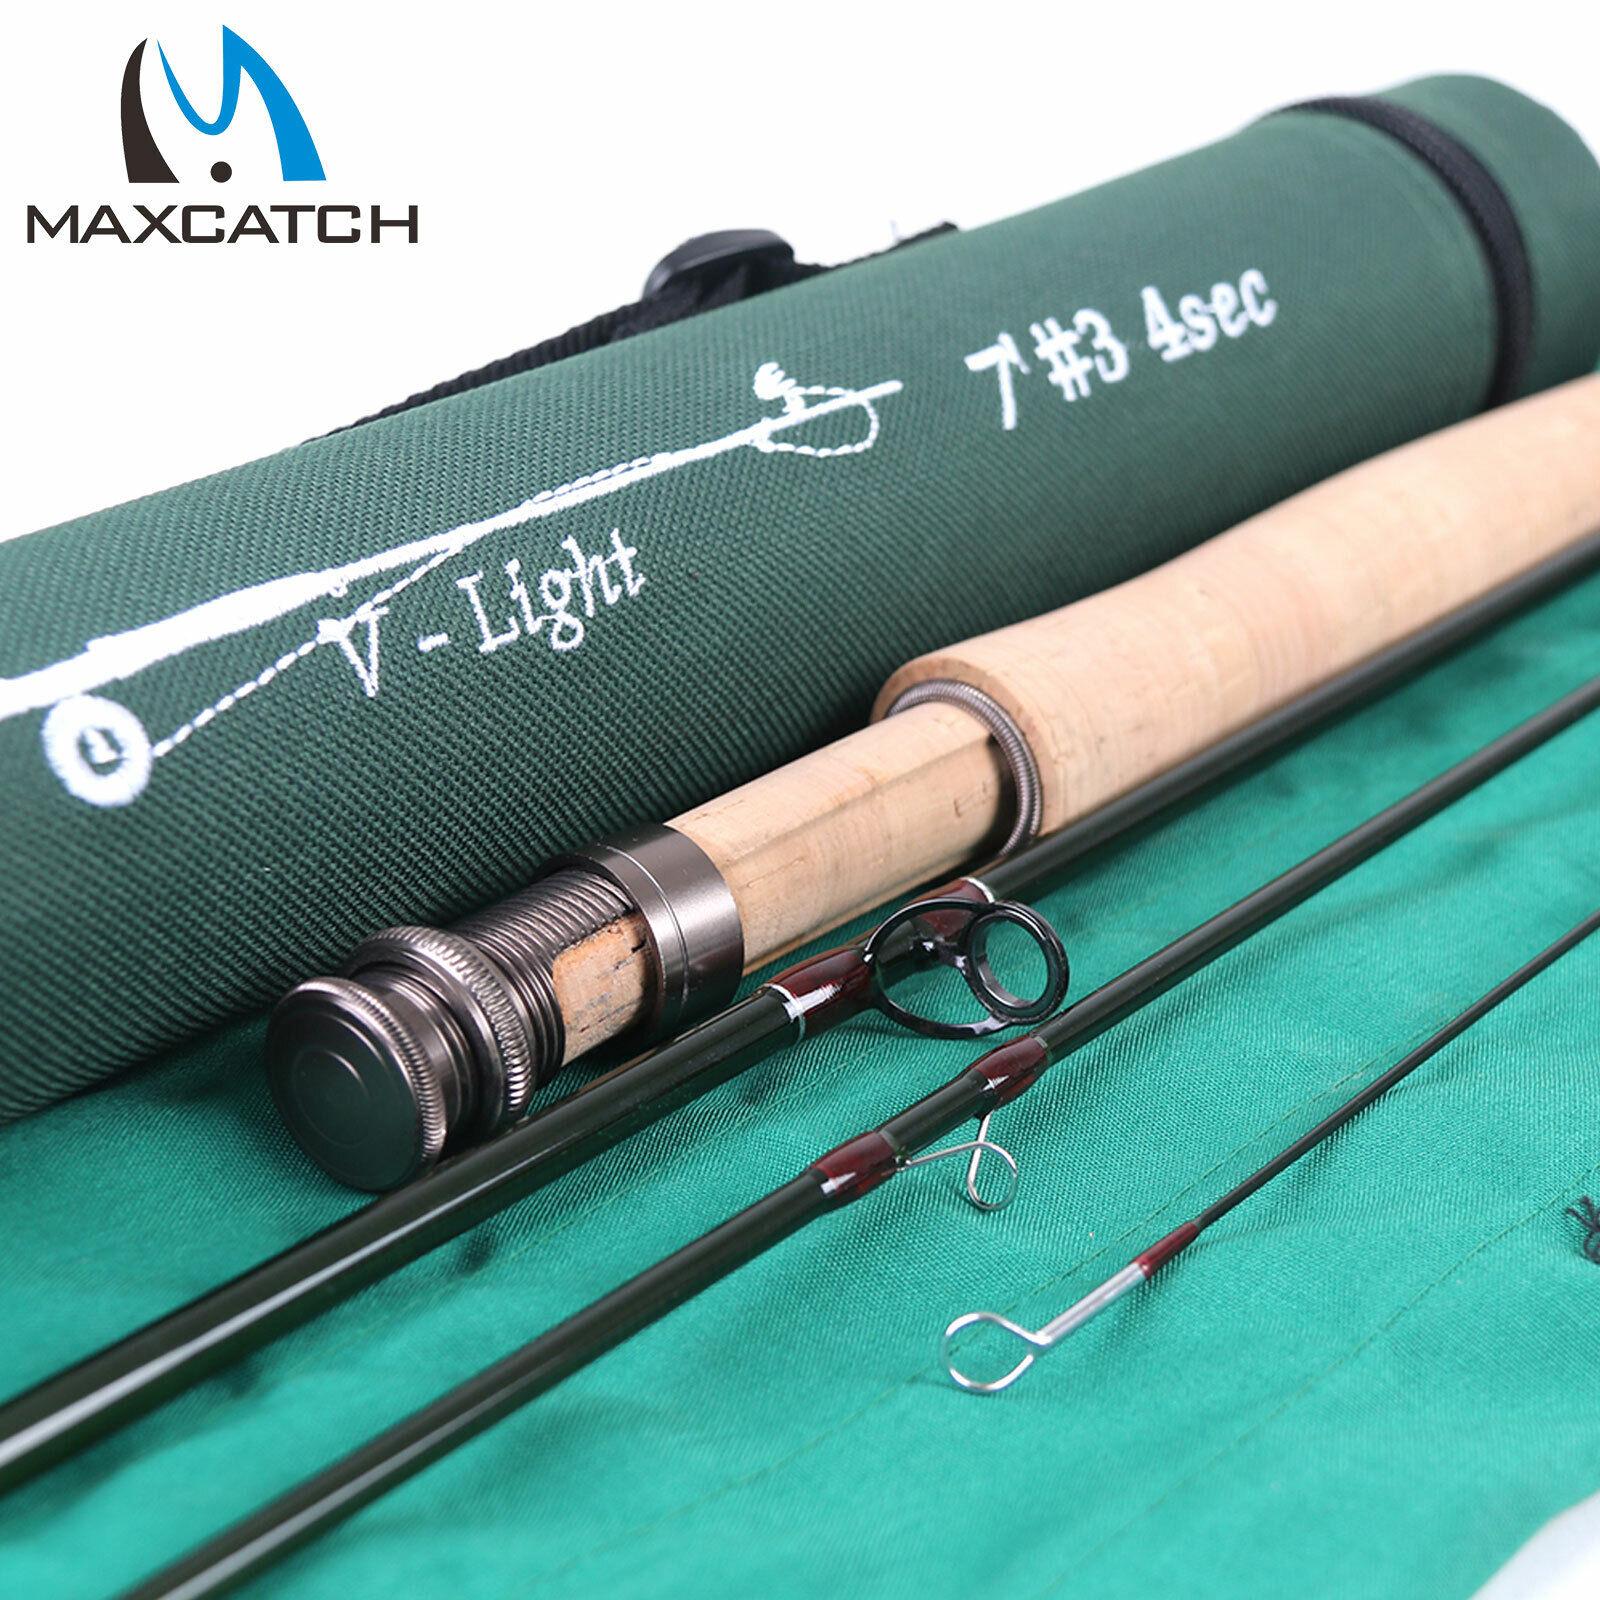 Maxcatch 1 2 3WT Fly Fishing Rod 6'   6'6   7'   7'6  Graphite IM10 petit Creek